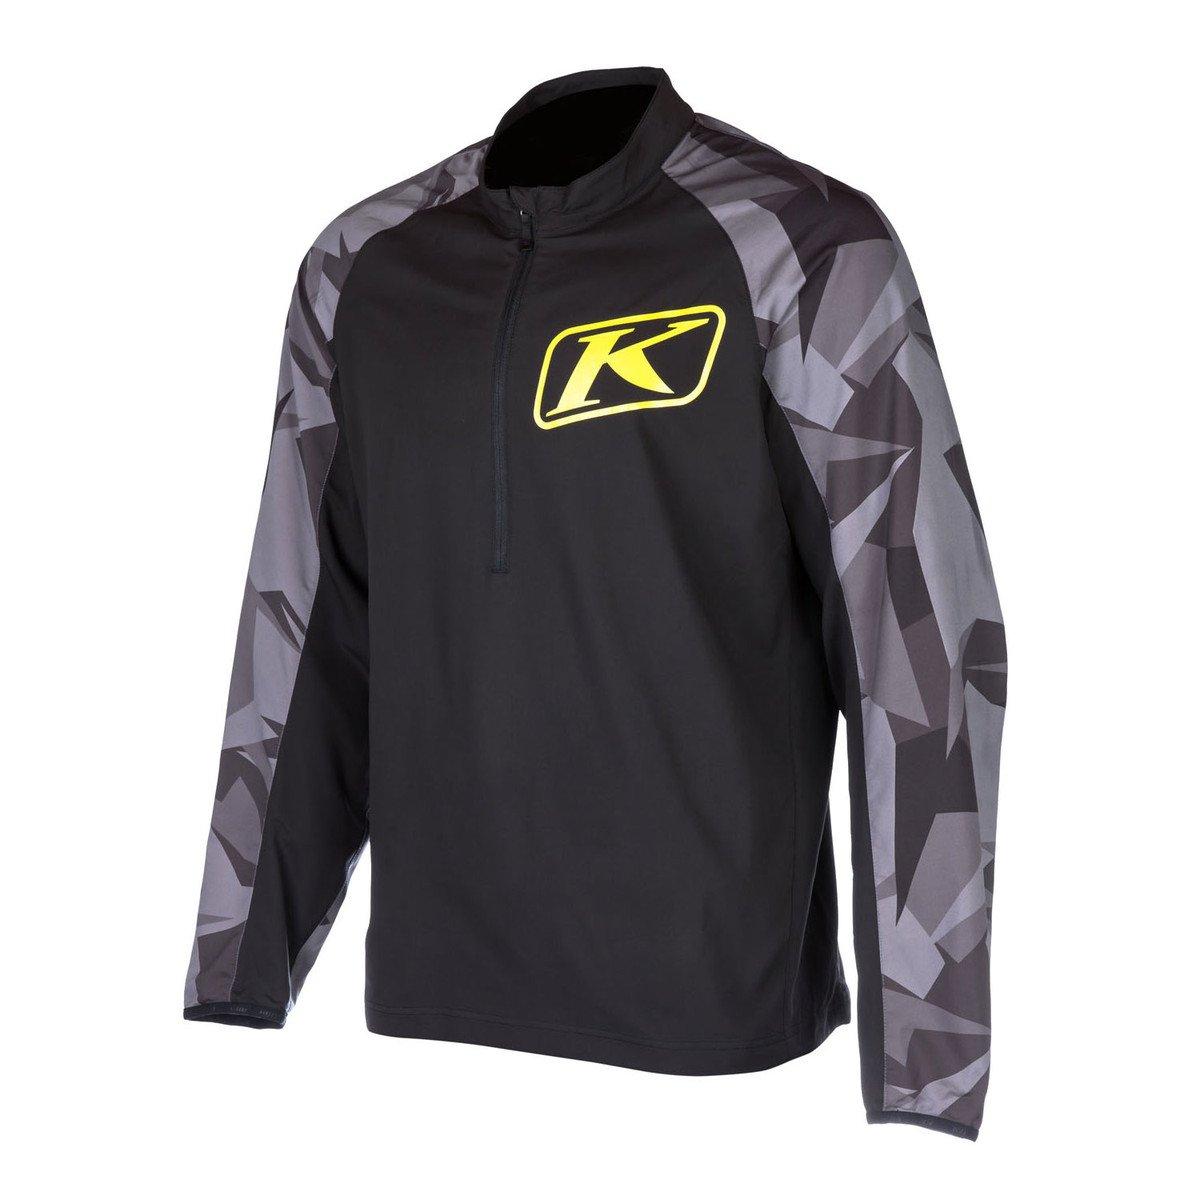 Klim Revolt Pullover - Black/XX-Large by Klim